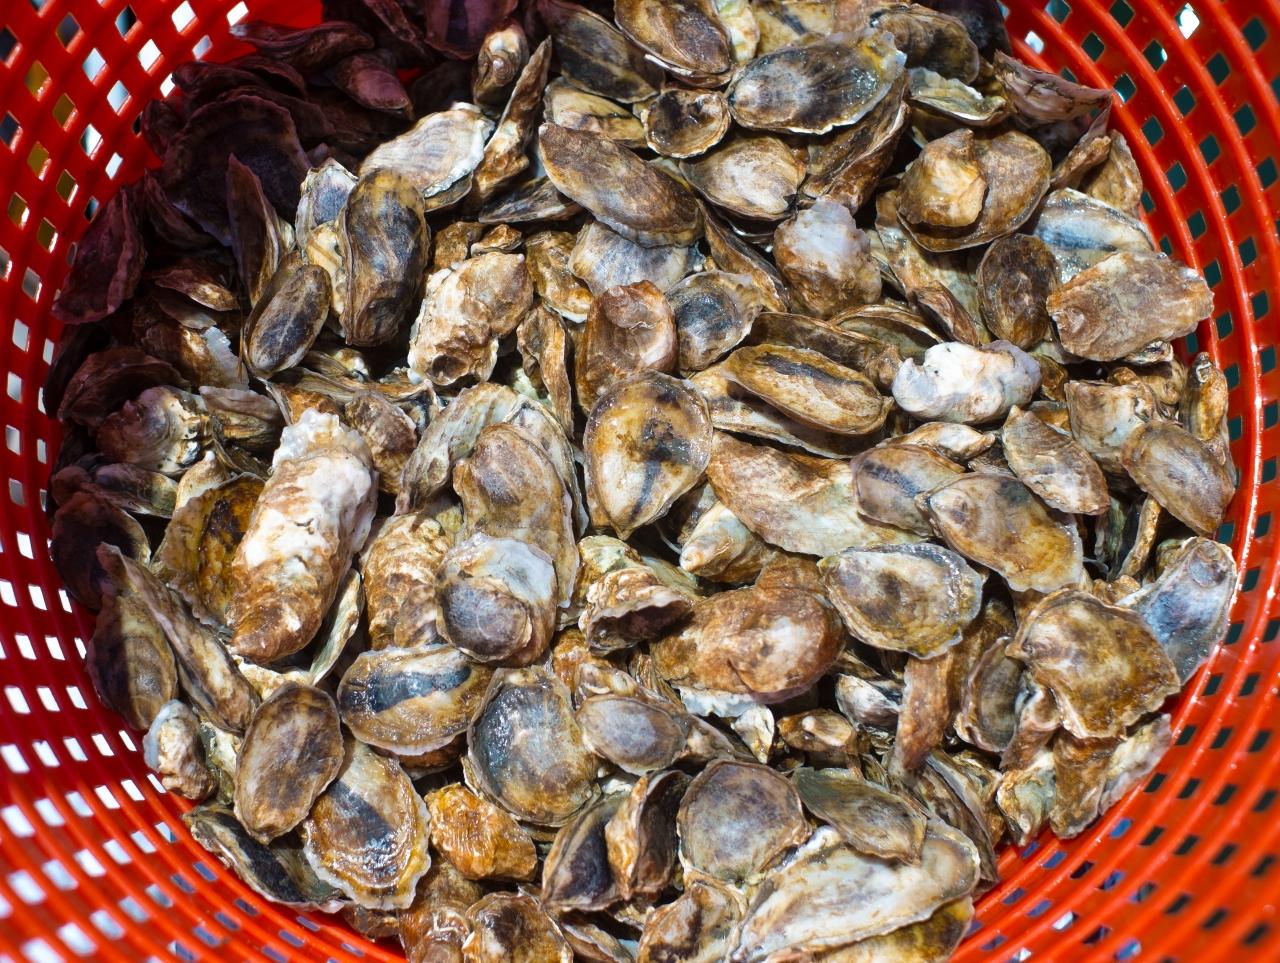 oyster seed in orange bushel basket.